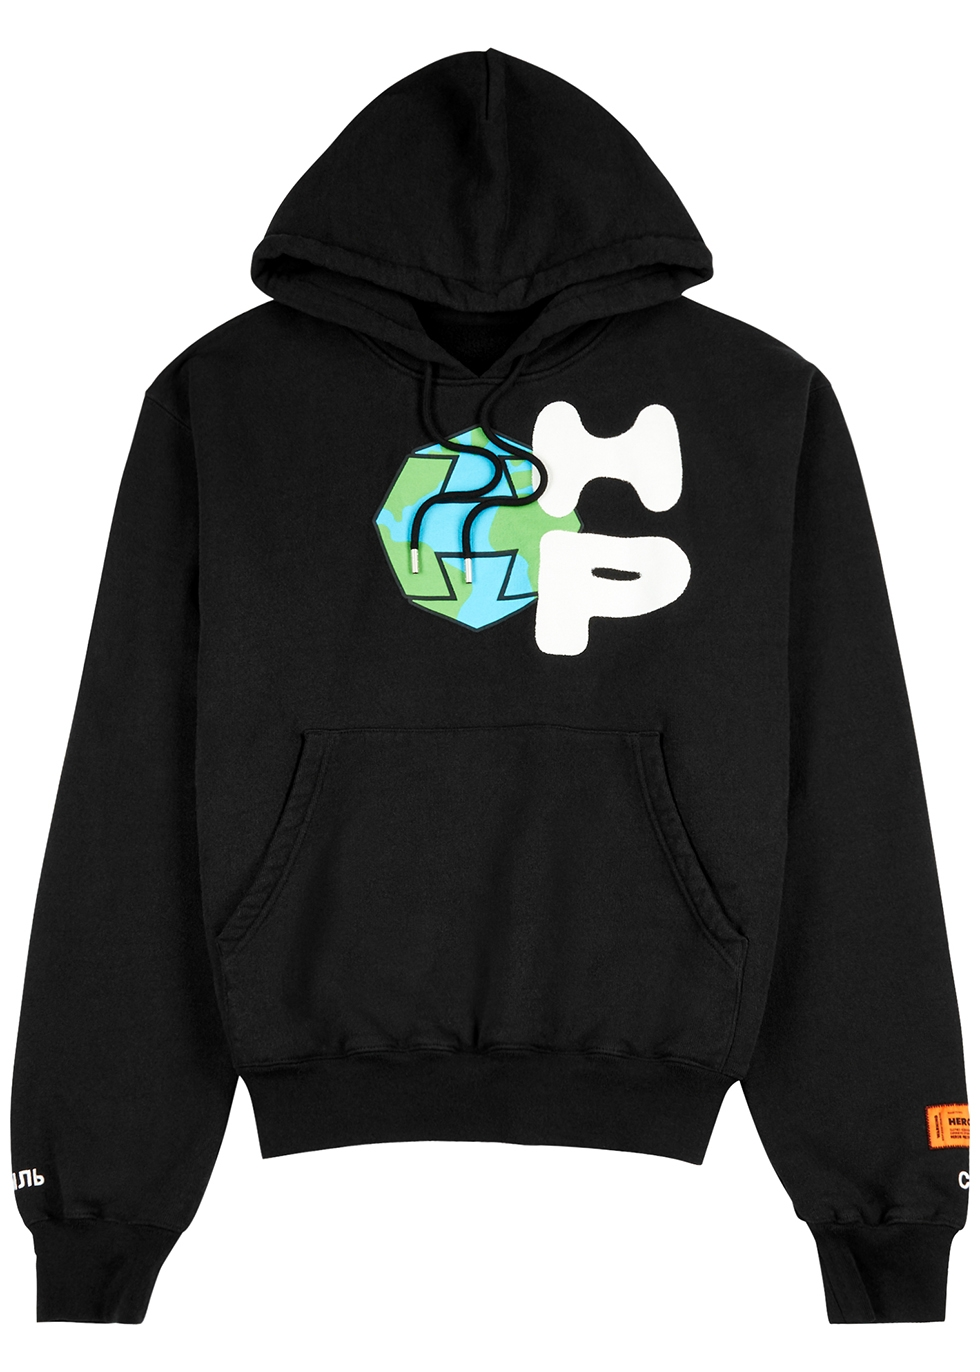 Black printed cotton sweatshirt